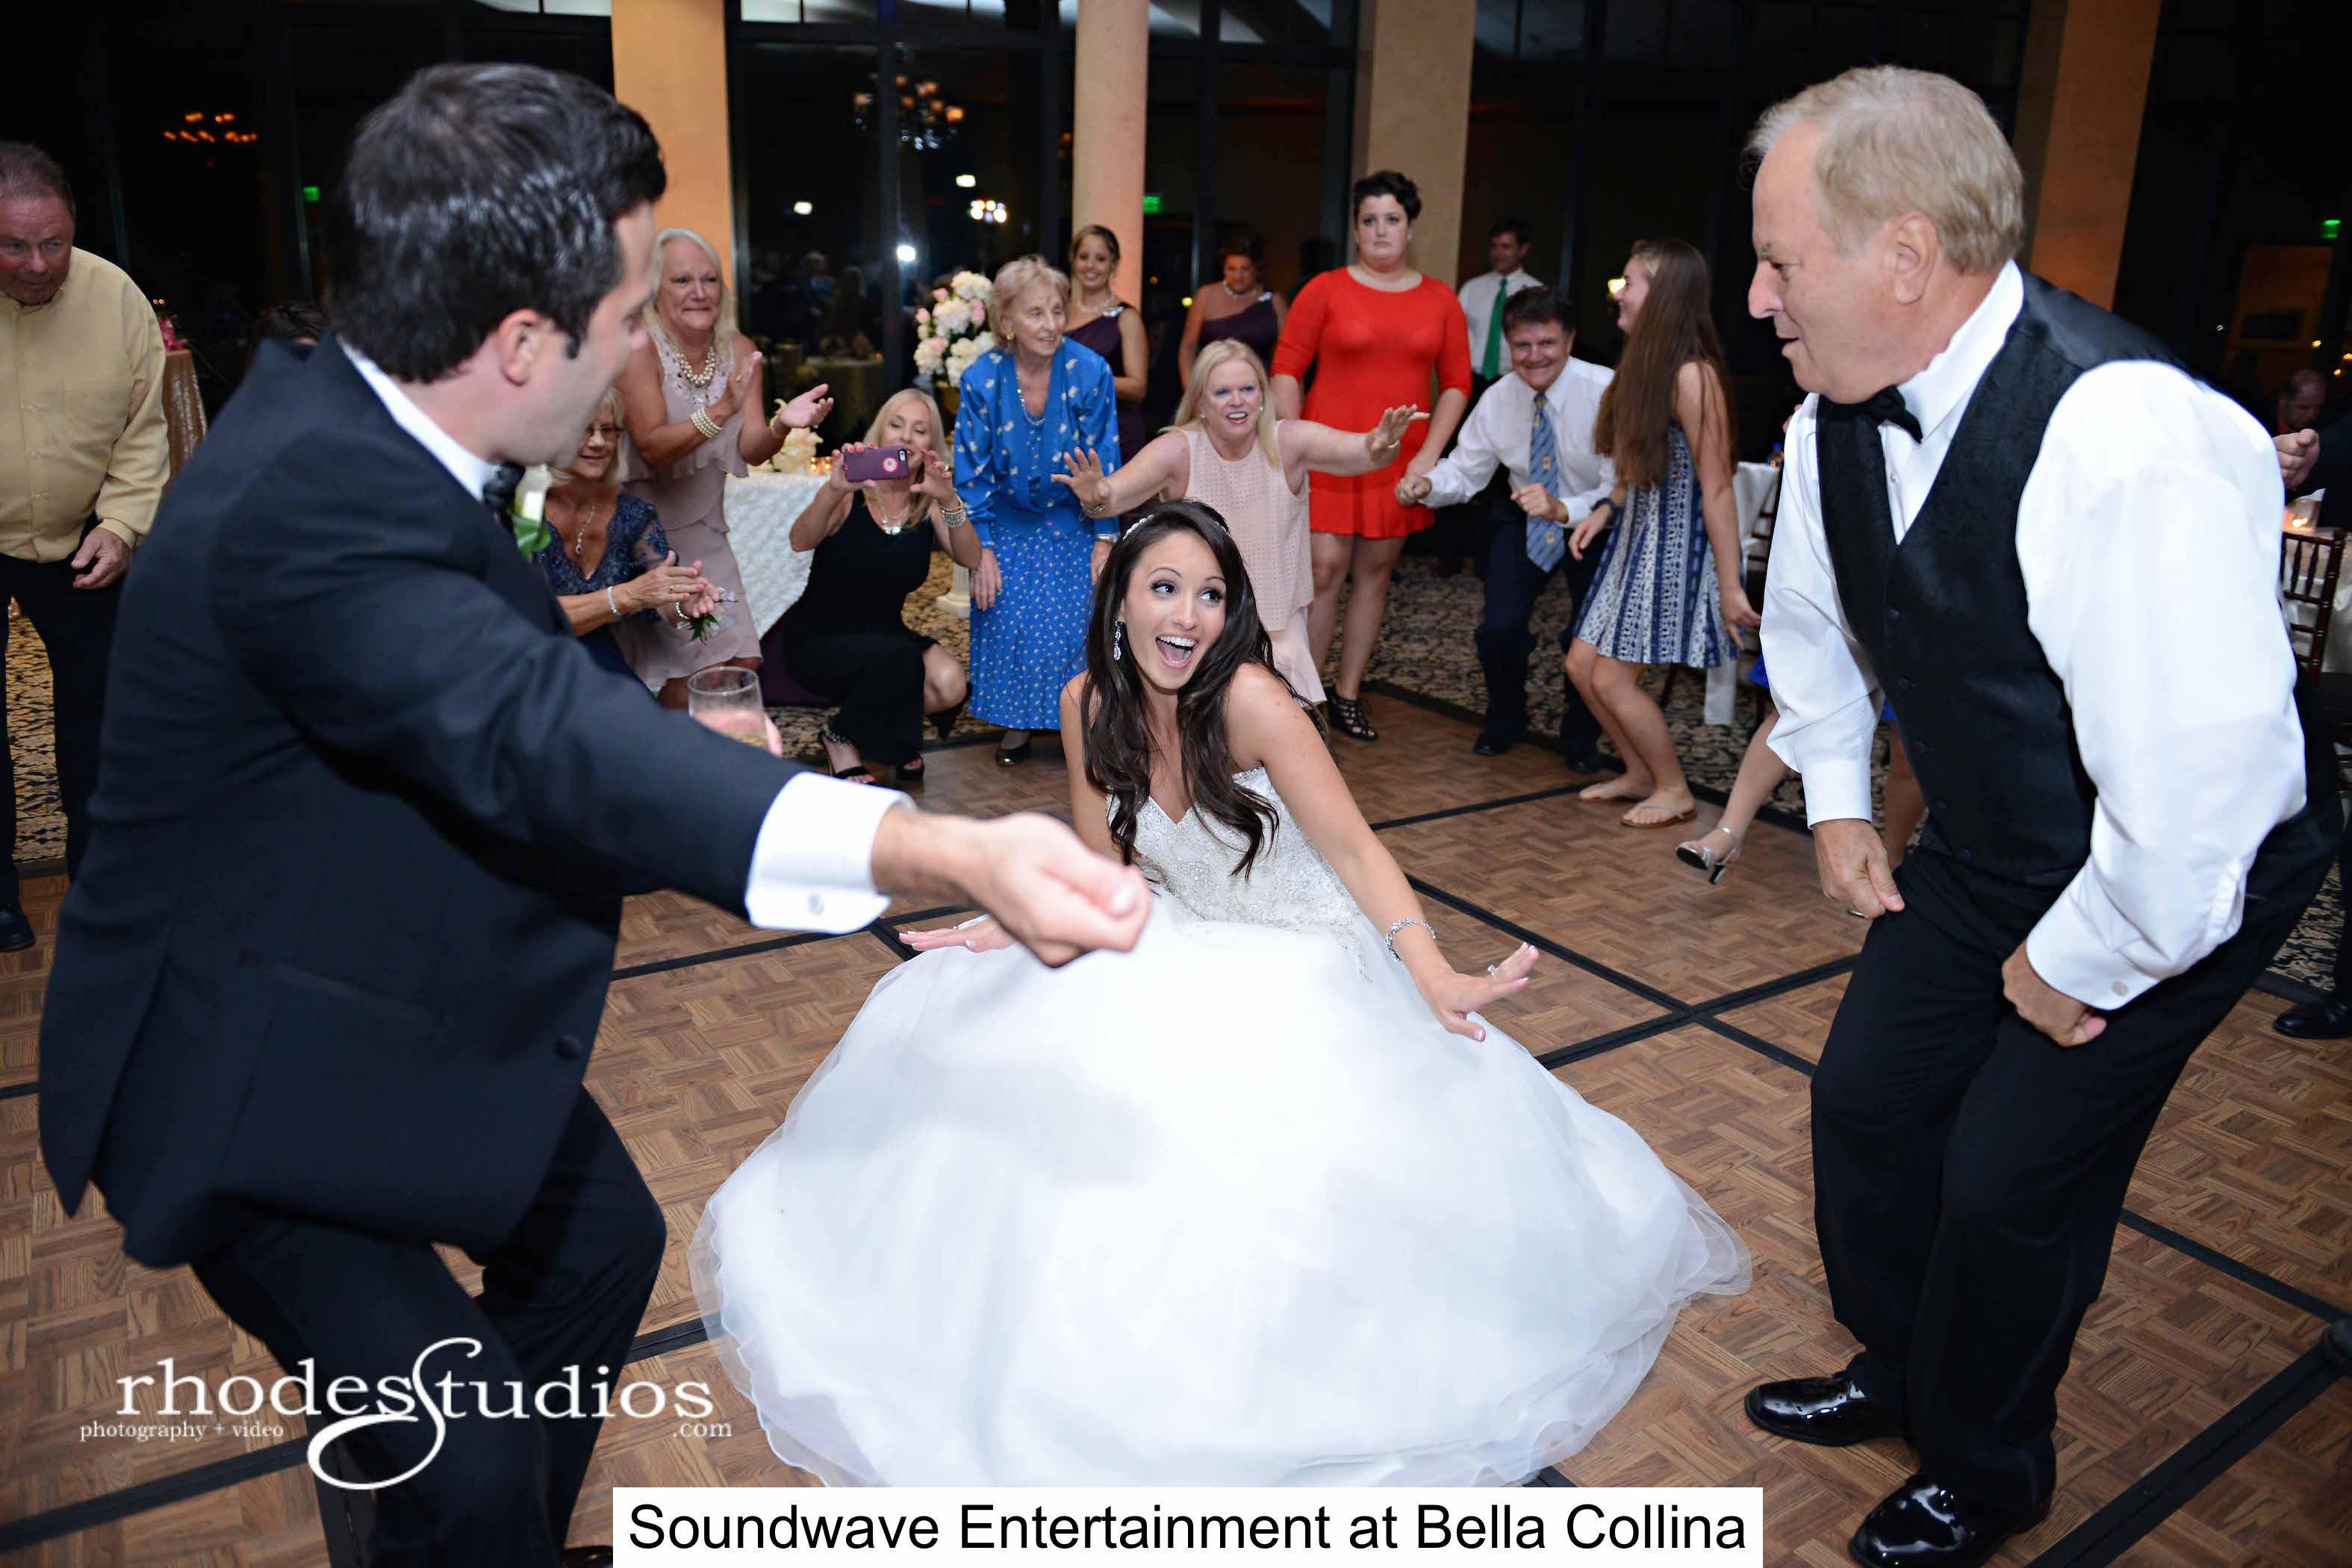 Soundwave Entertainment - Our Orlando Weddings - Bella Collina - Orlando, FL